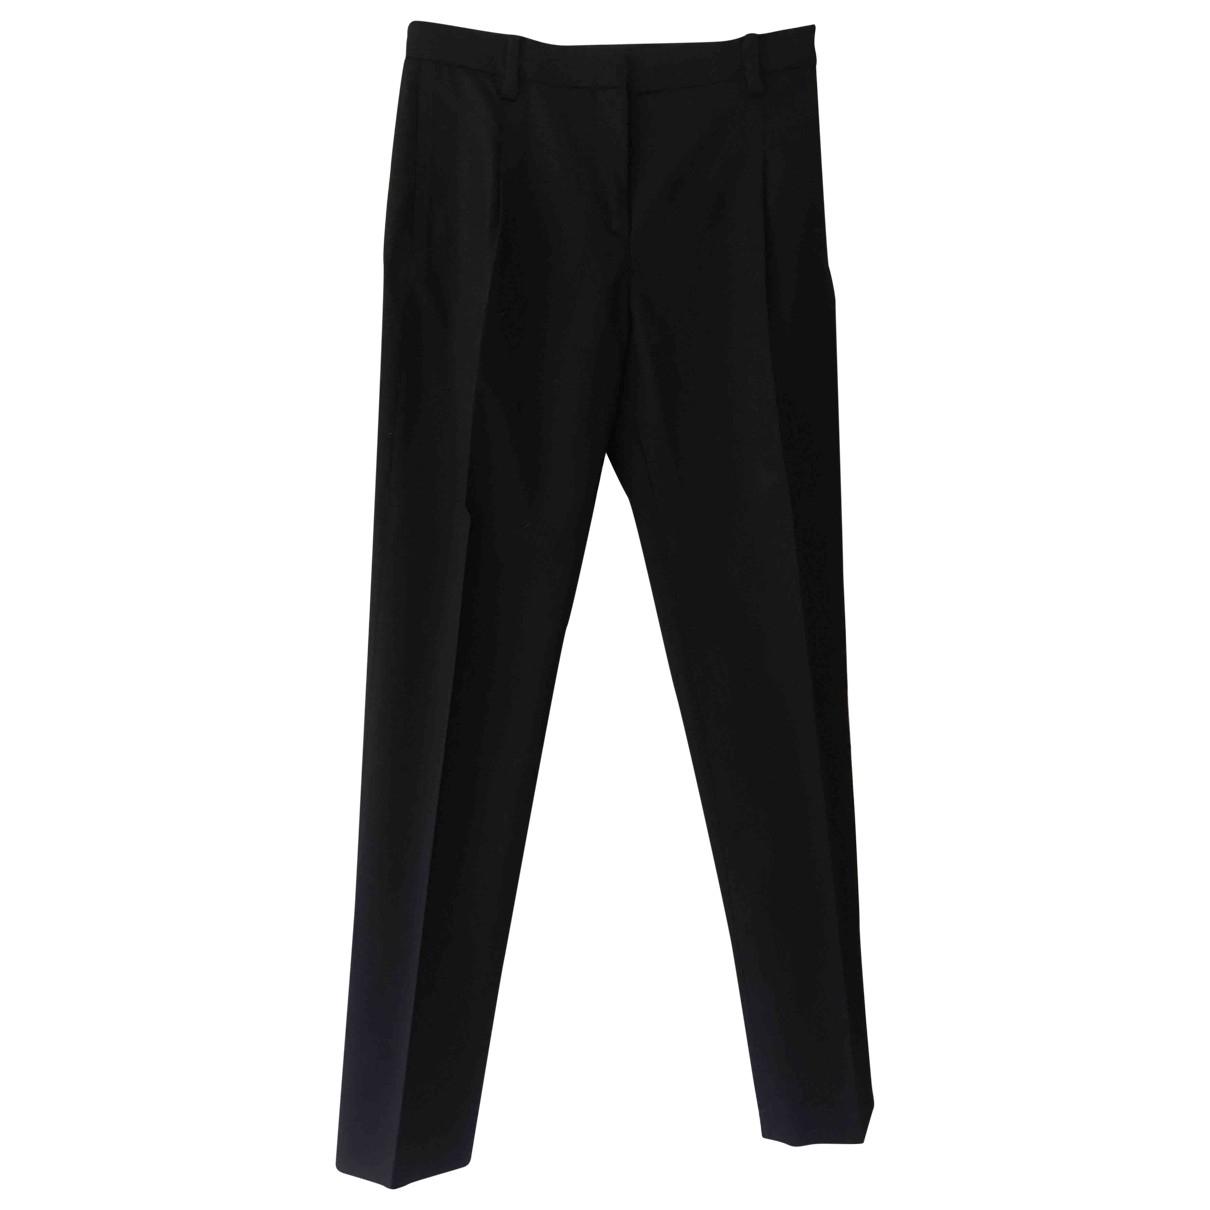 Valentino Garavani \N Black Wool Trousers for Women 36 IT